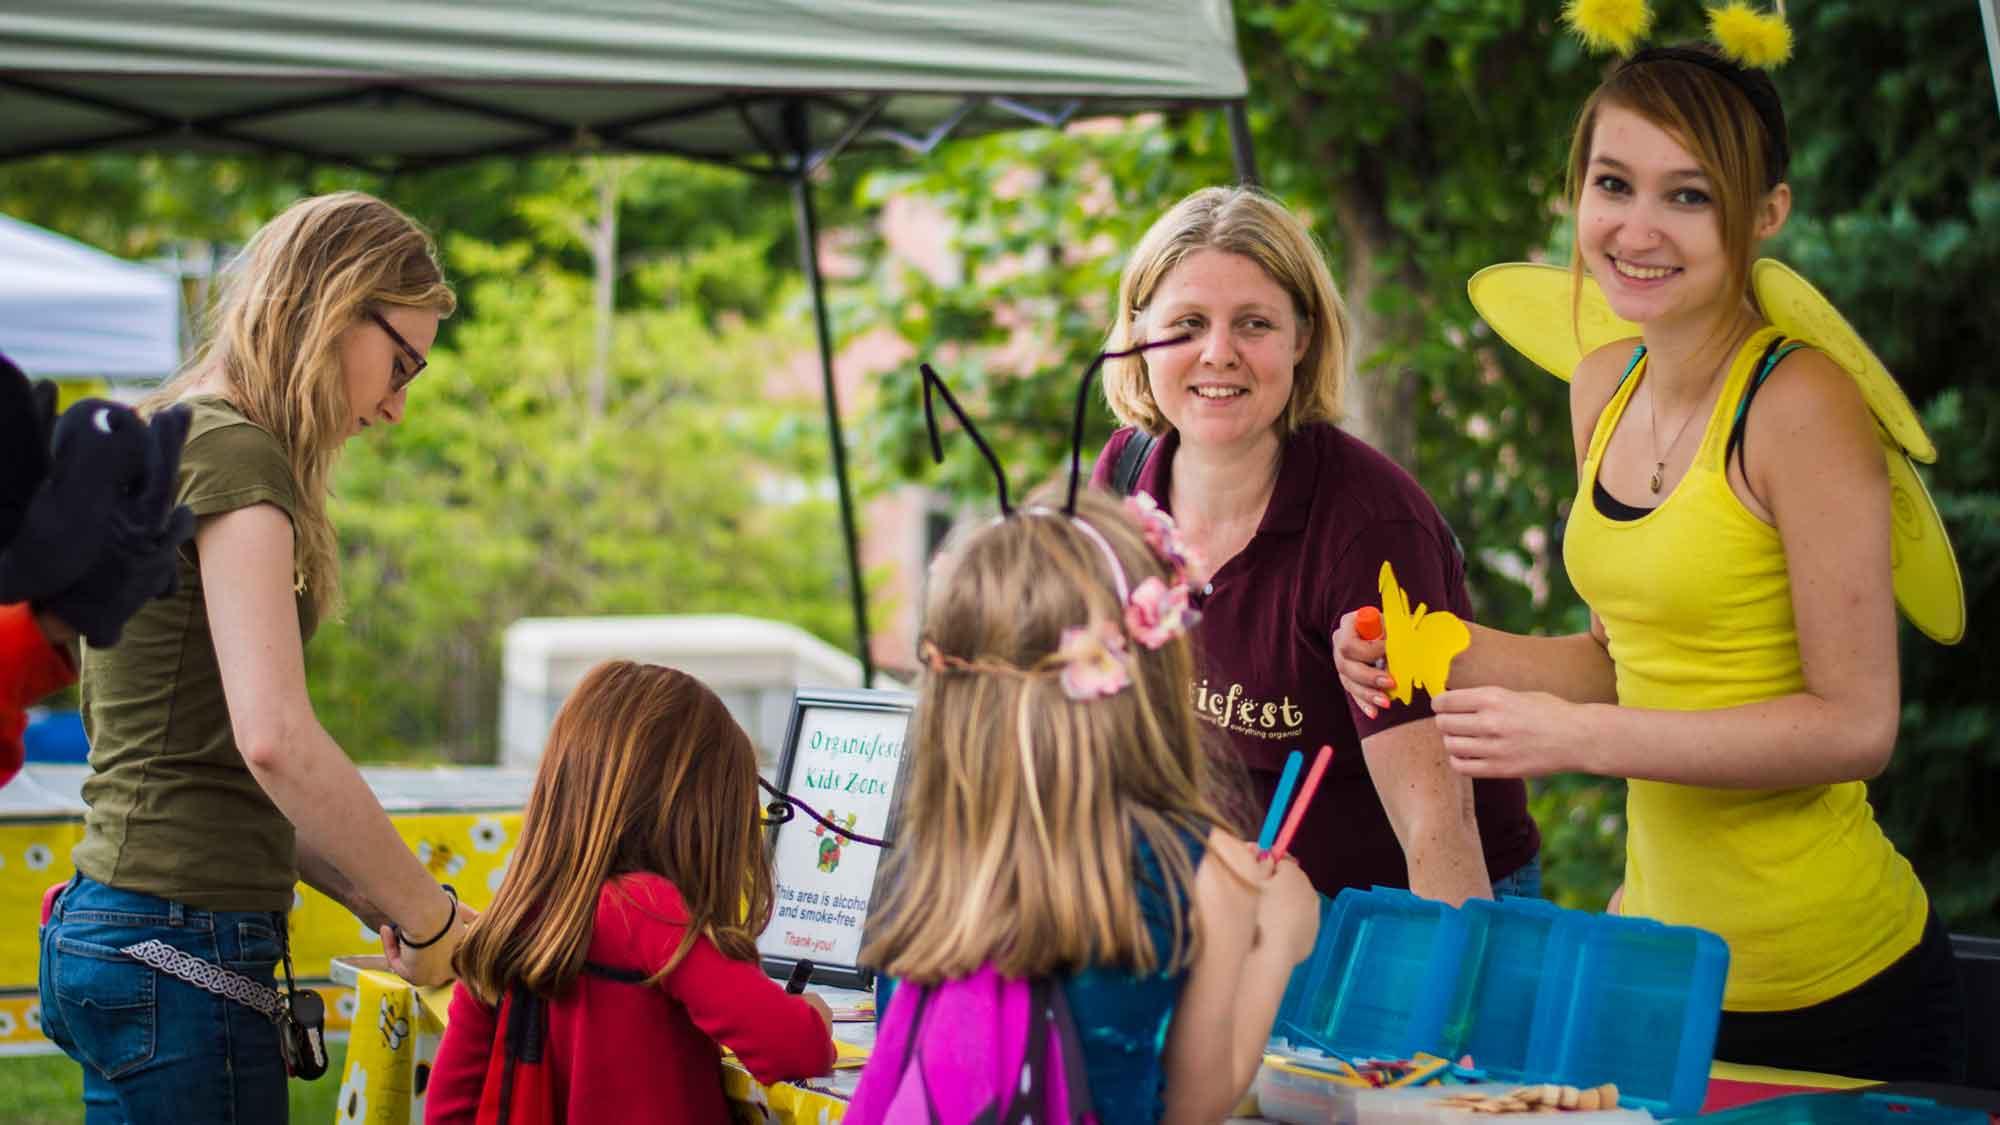 eco-friendly-family-fun-at-ashevilles-organicfest-celebration